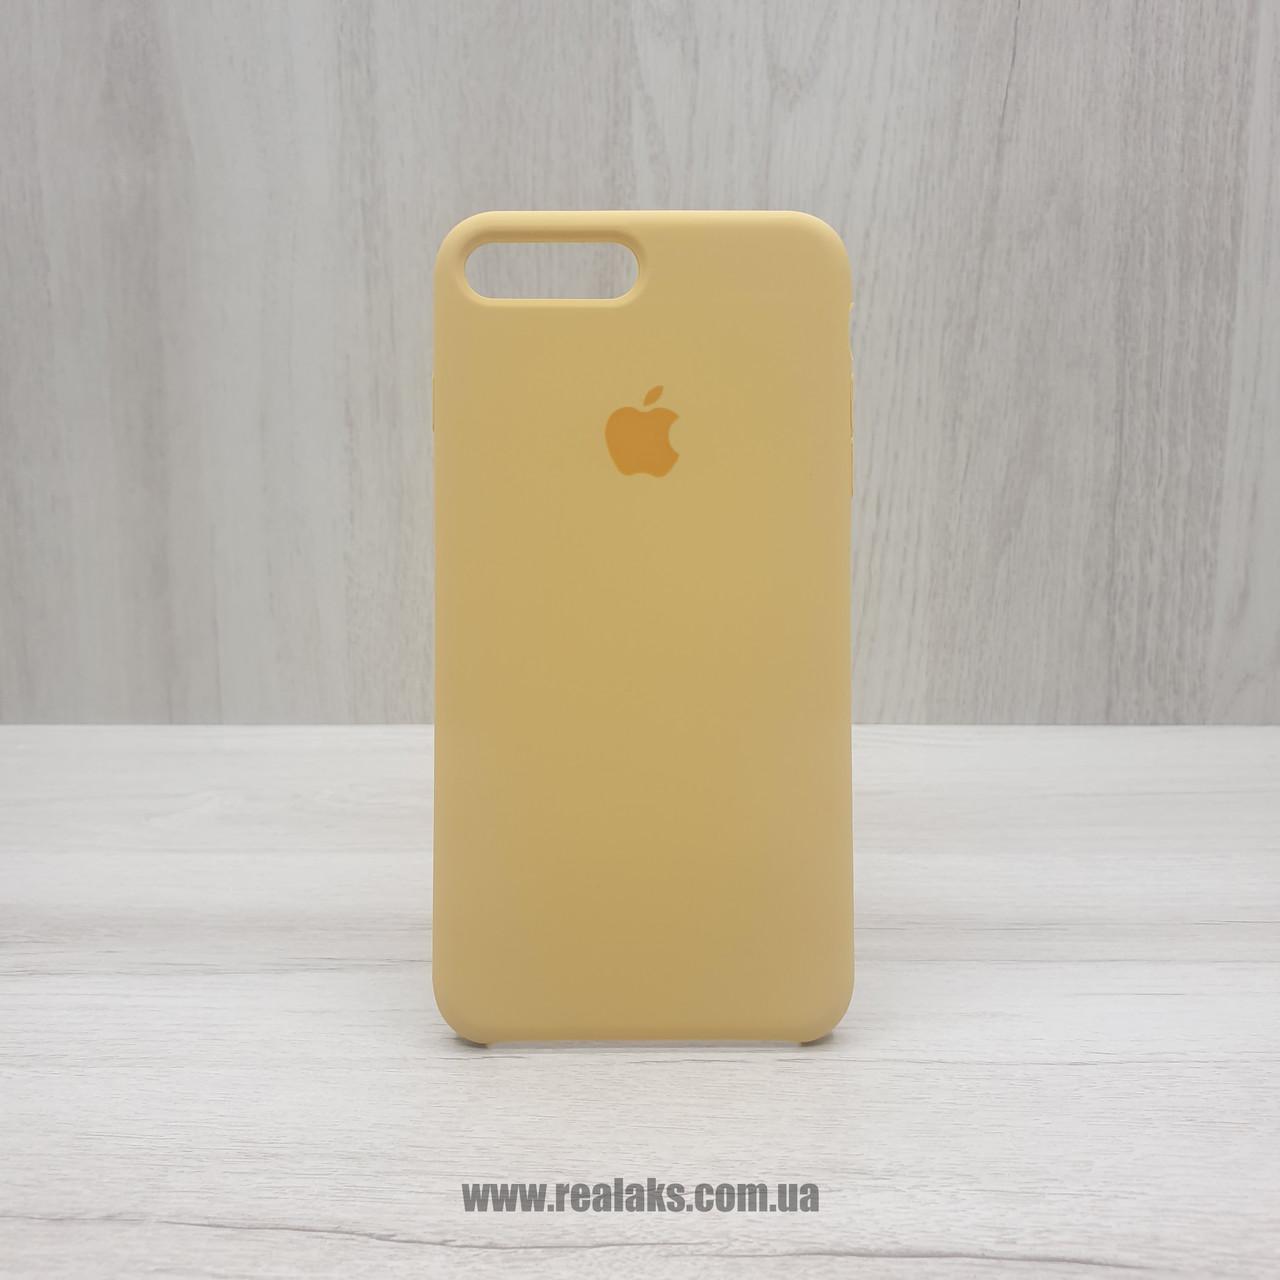 Чехол Silicone Case для Apple iPhone 7/8 Plus gold